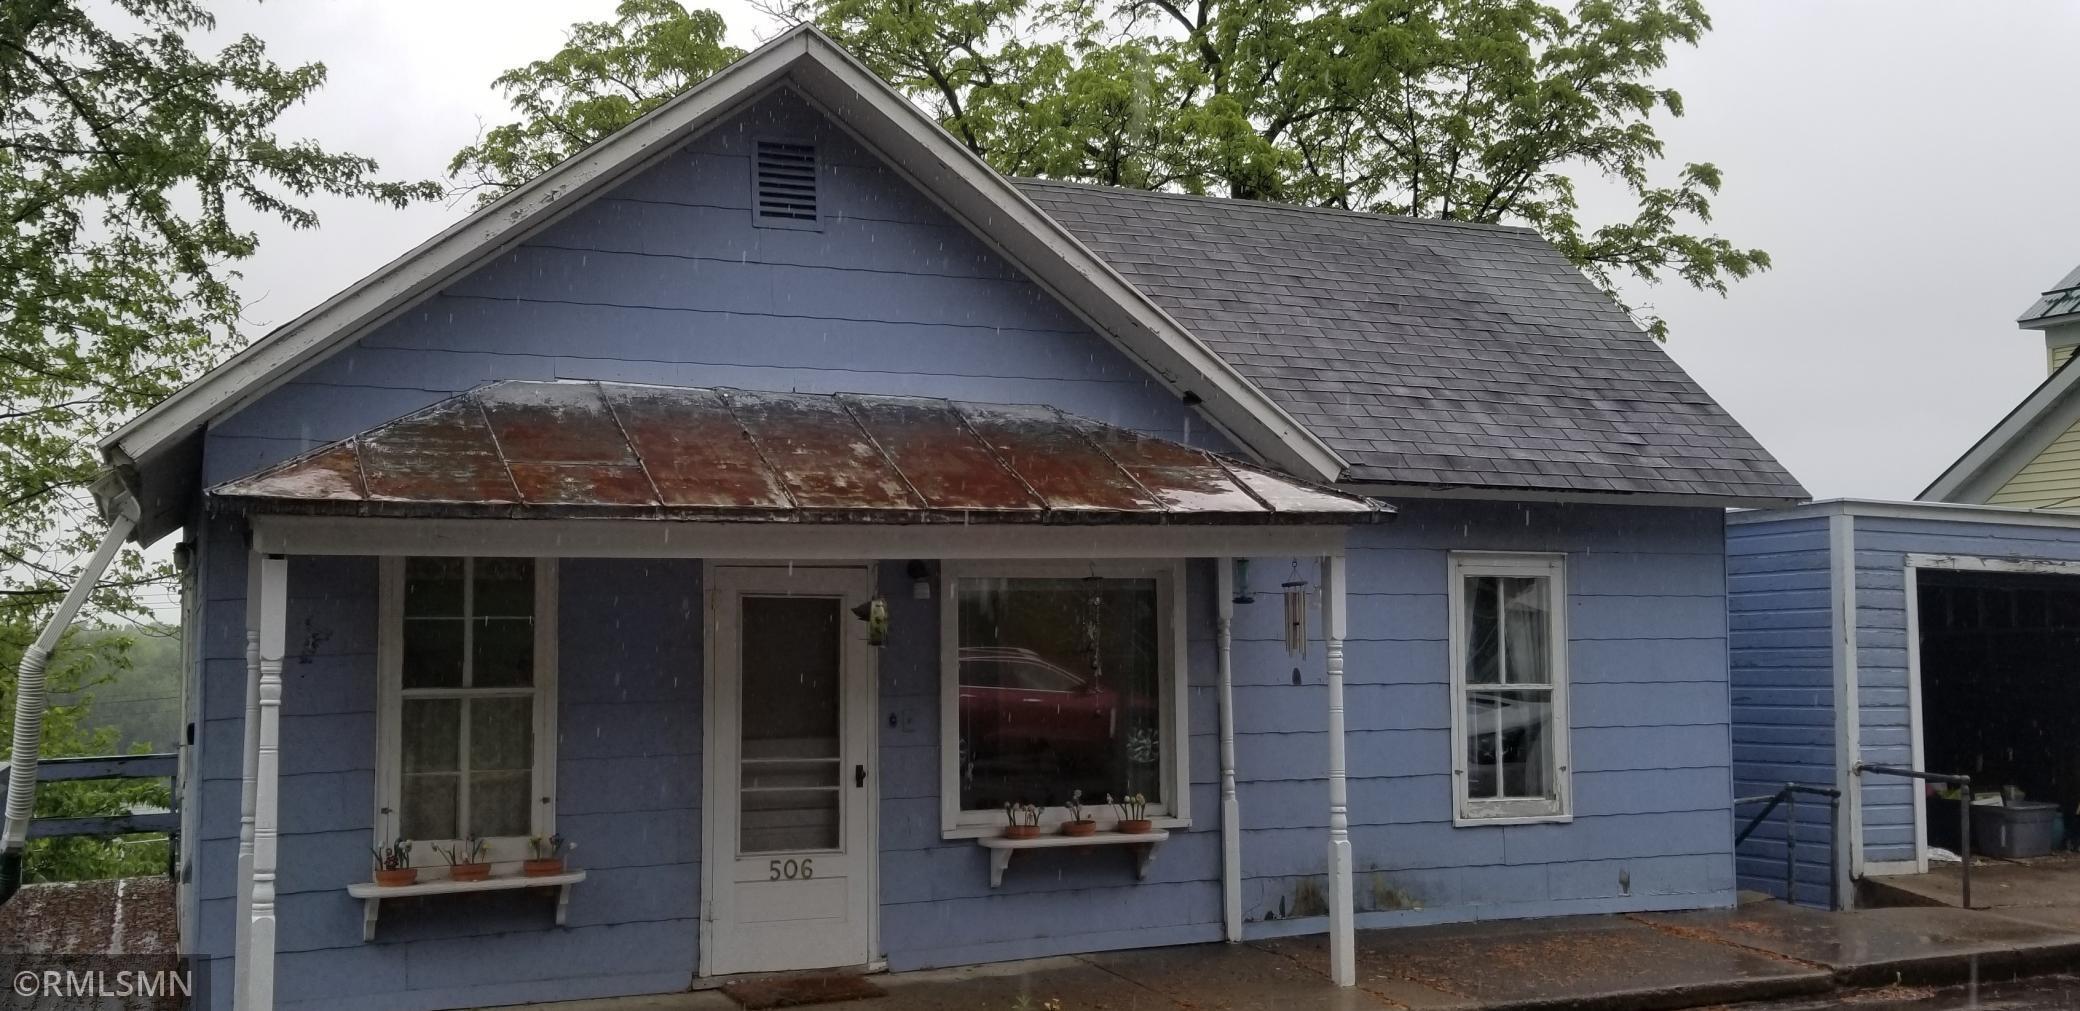 506 S 2nd Street Property Photo